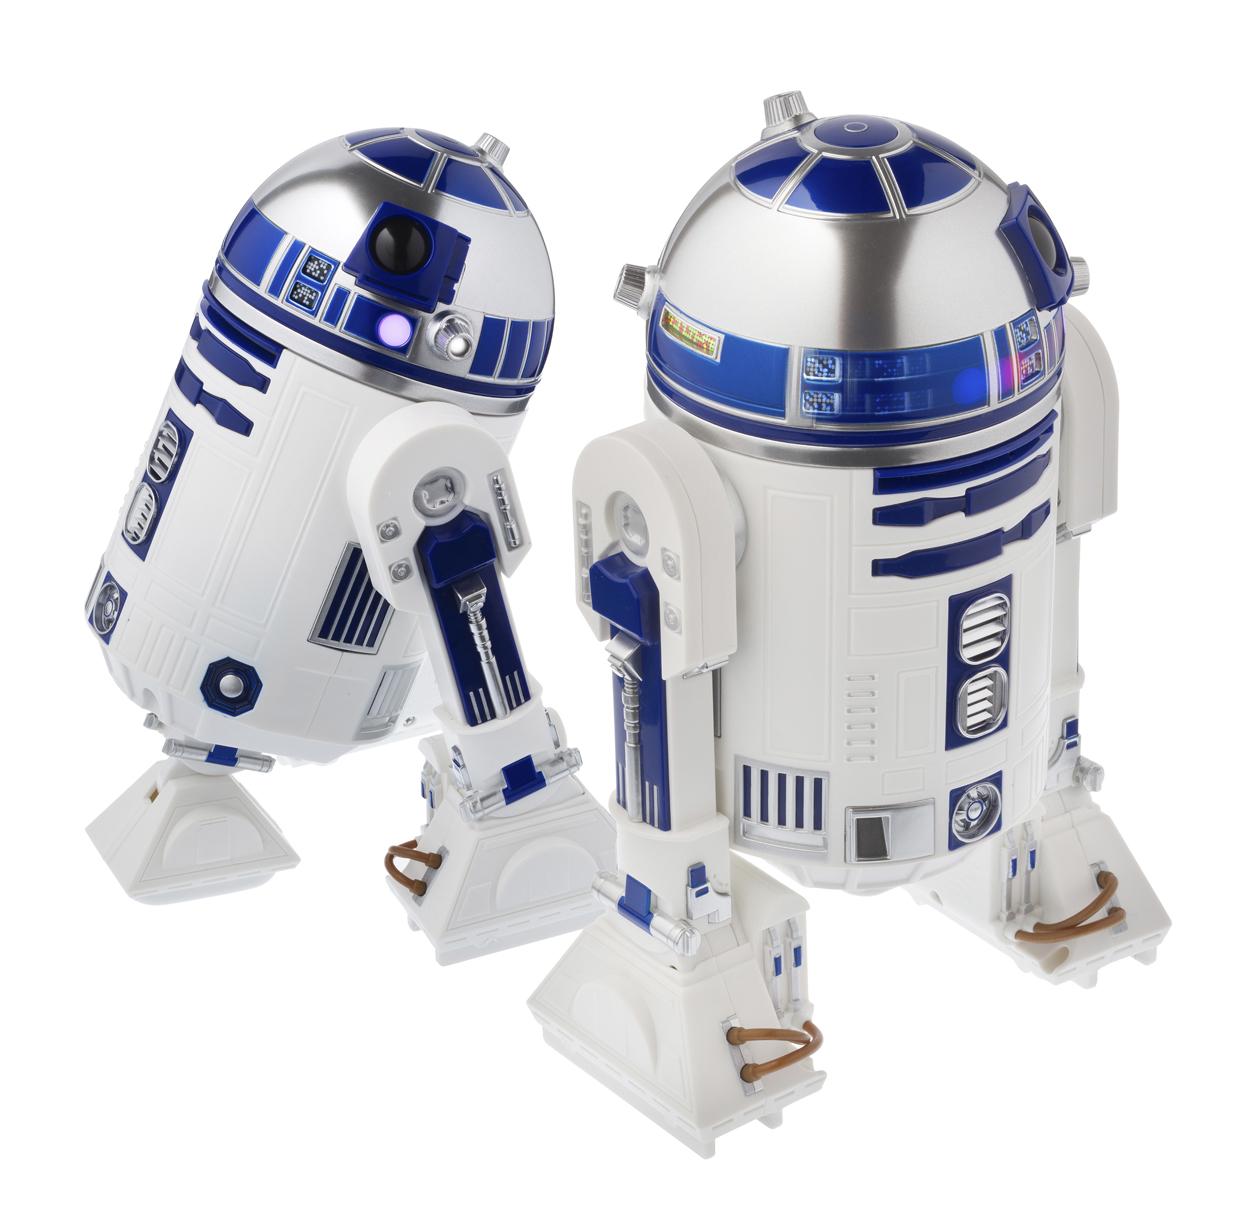 StarWars R2-D2 droid image